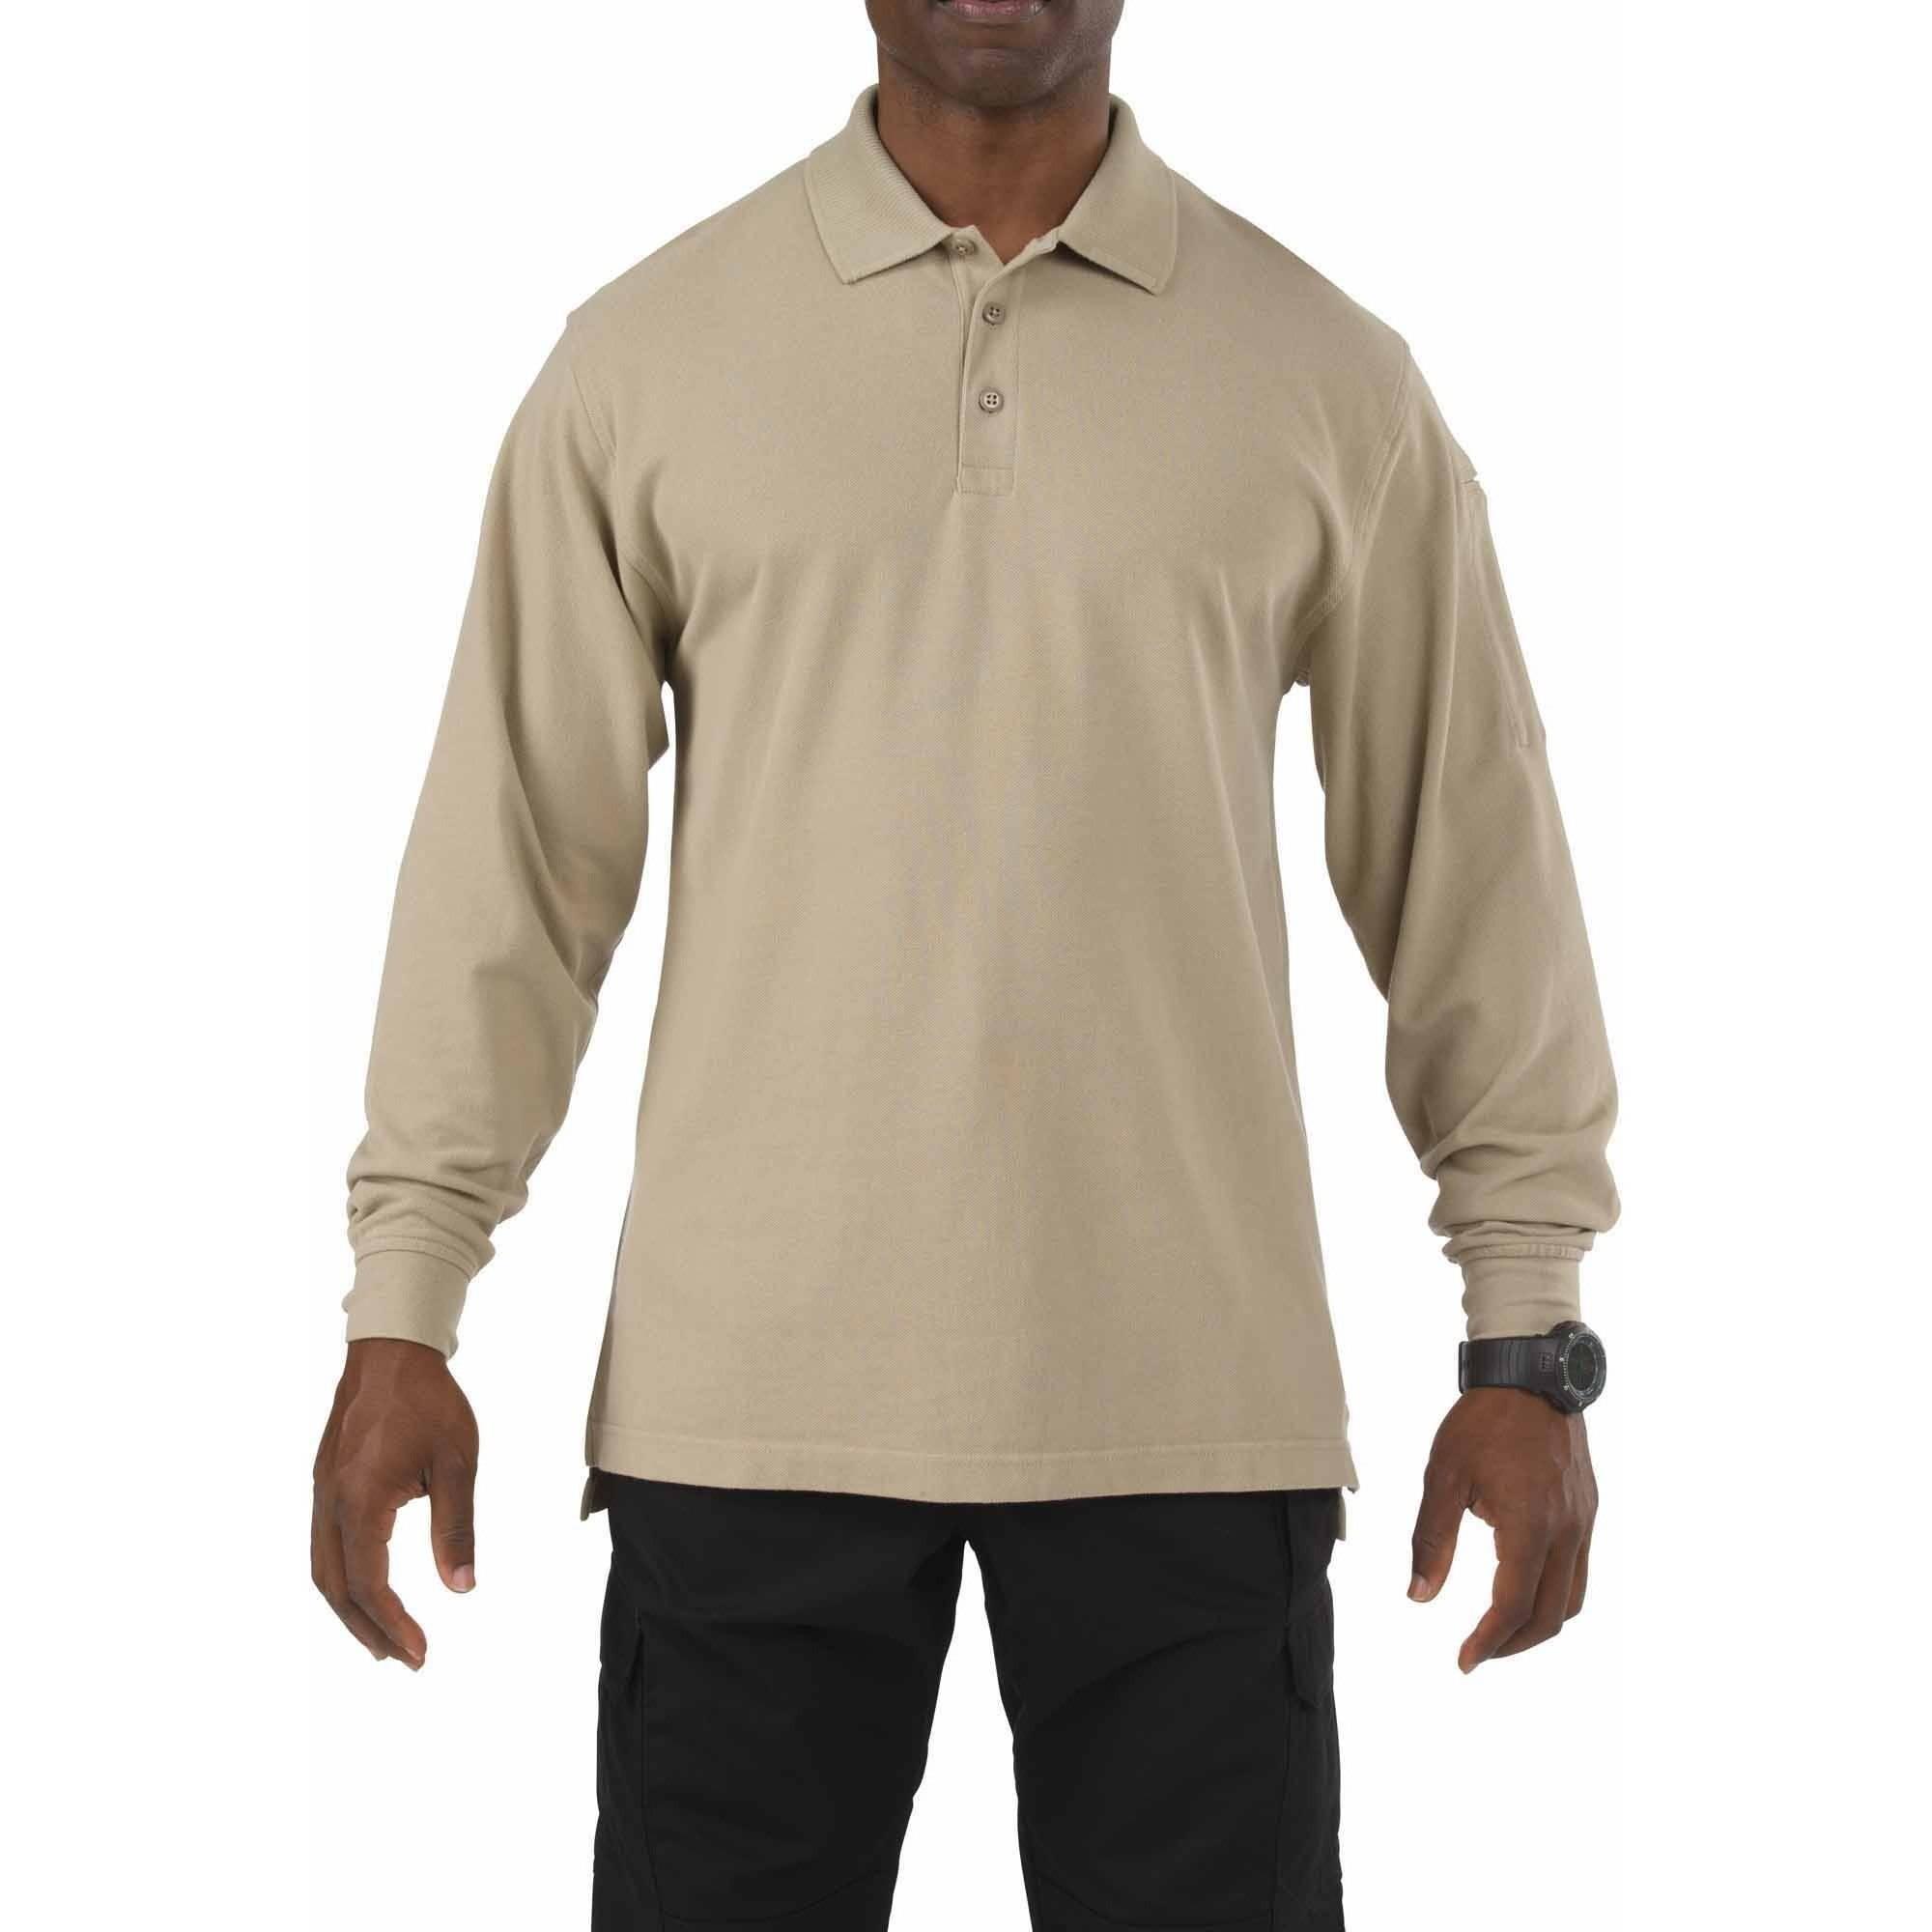 5.11 Tactical Long Sleeve Professional Polo Shirt, Silver Tan, Tall